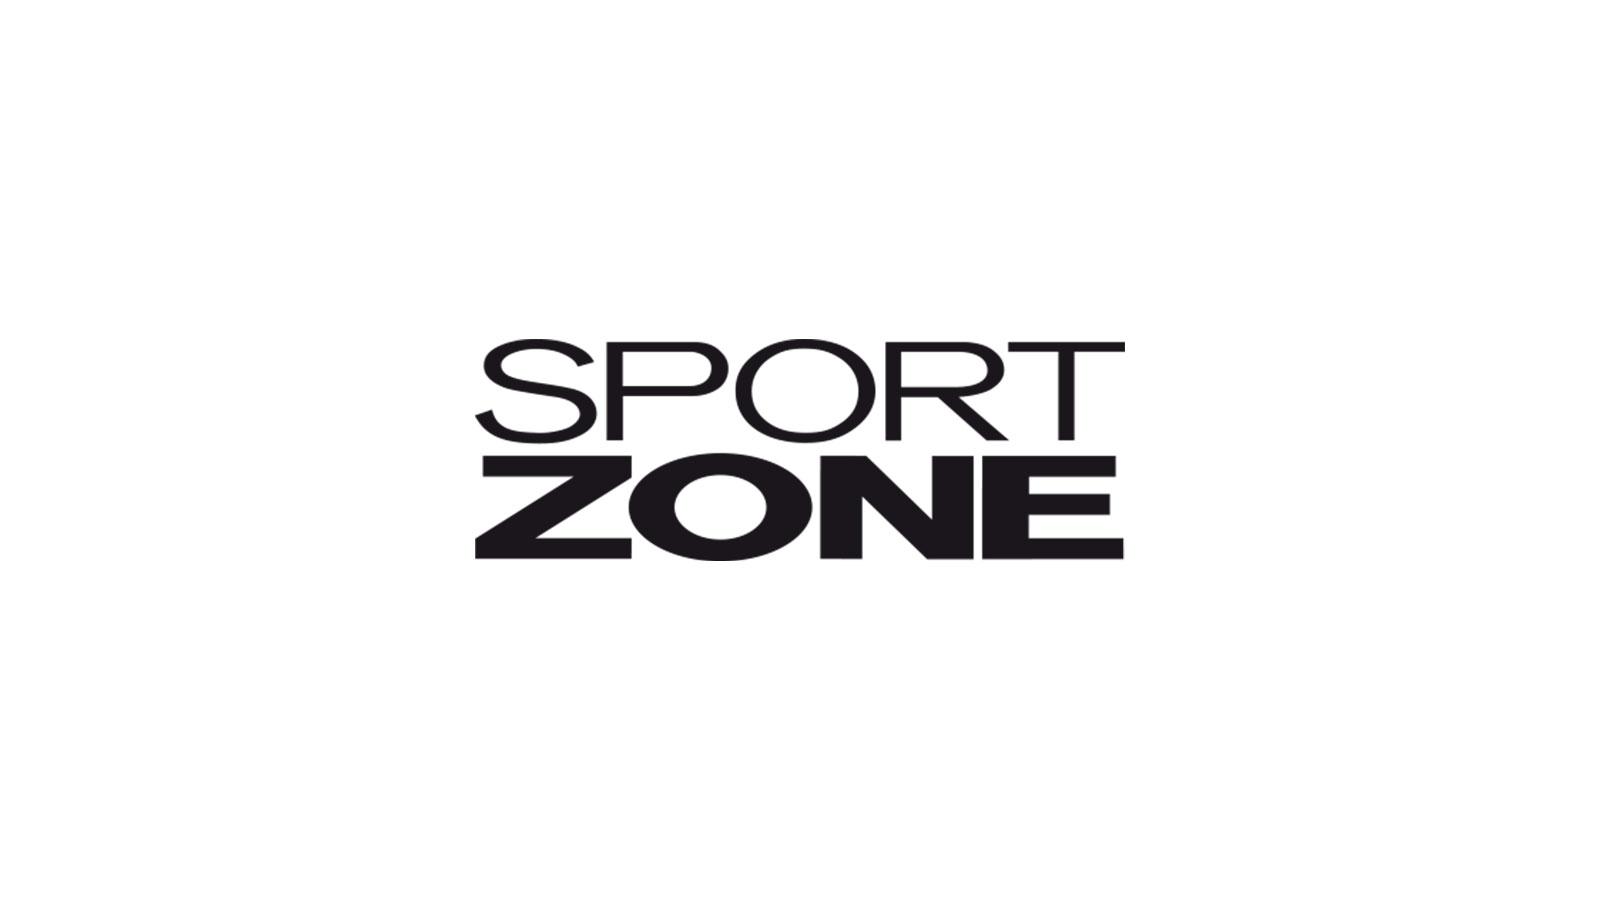 Sportzone logo